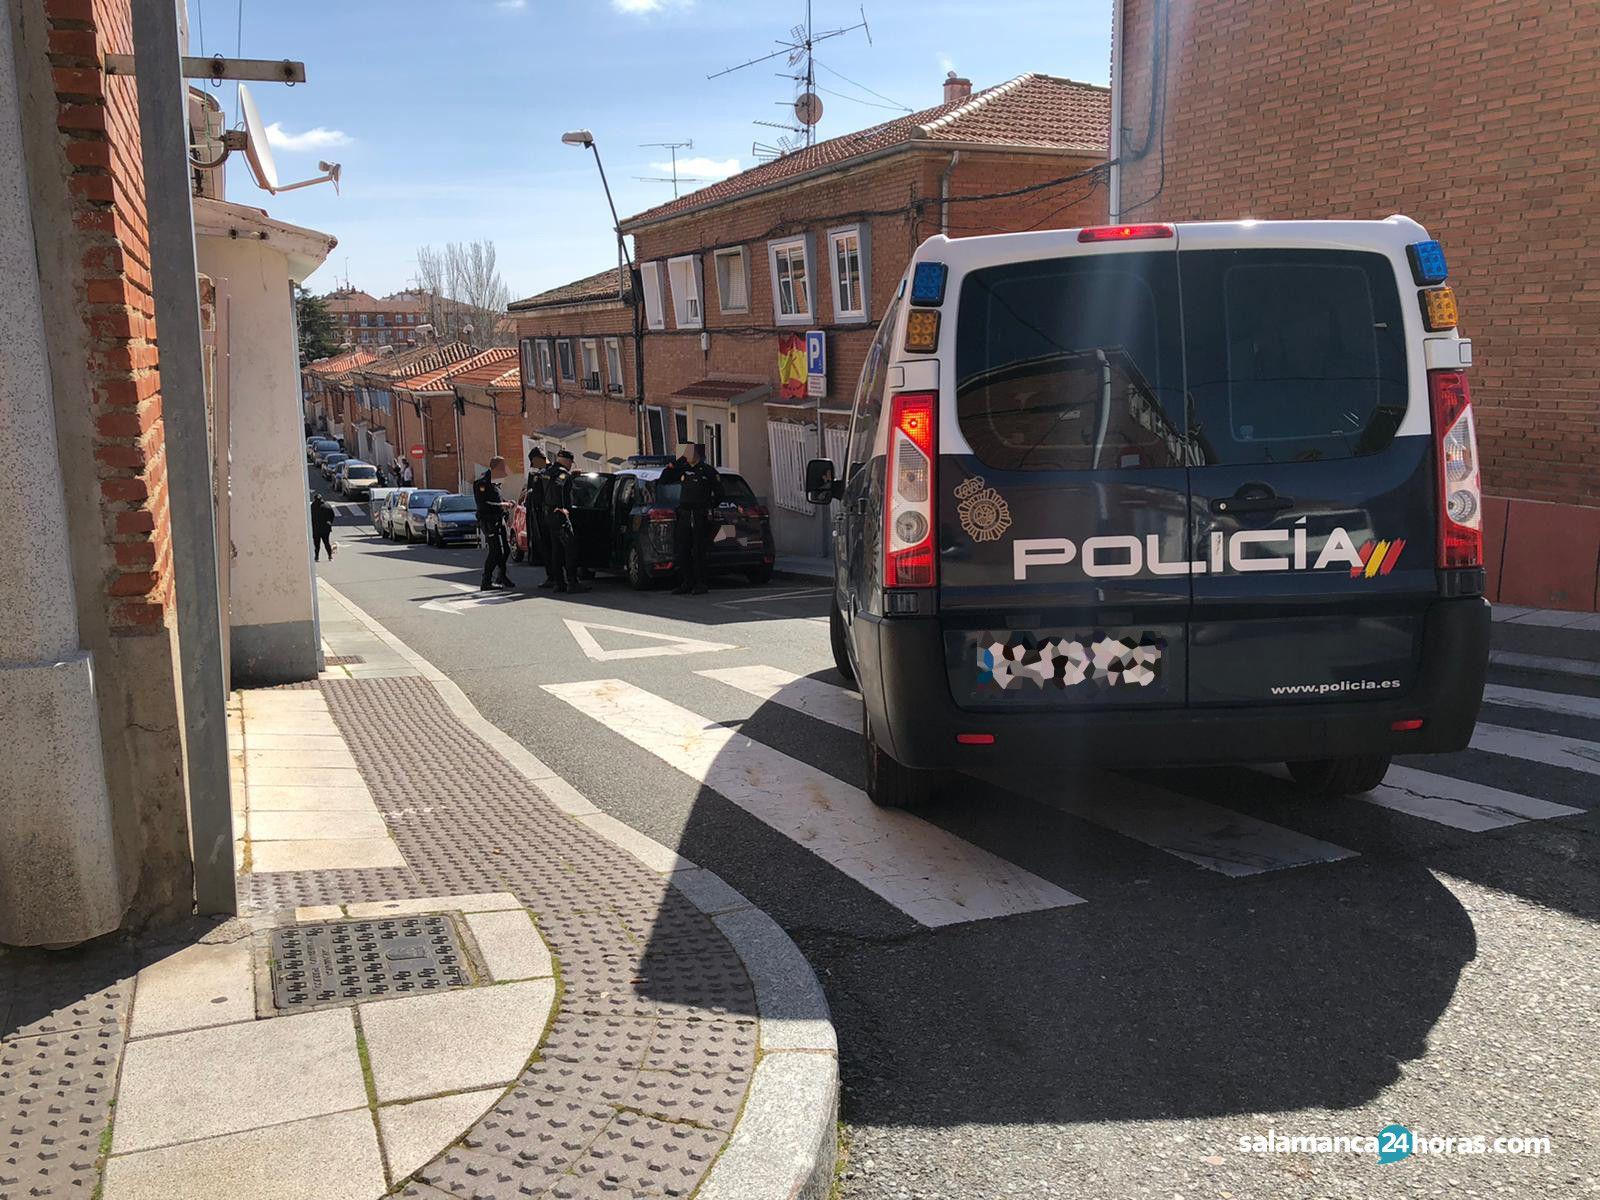 Intervención Policía Policia en Pizarrales (9)